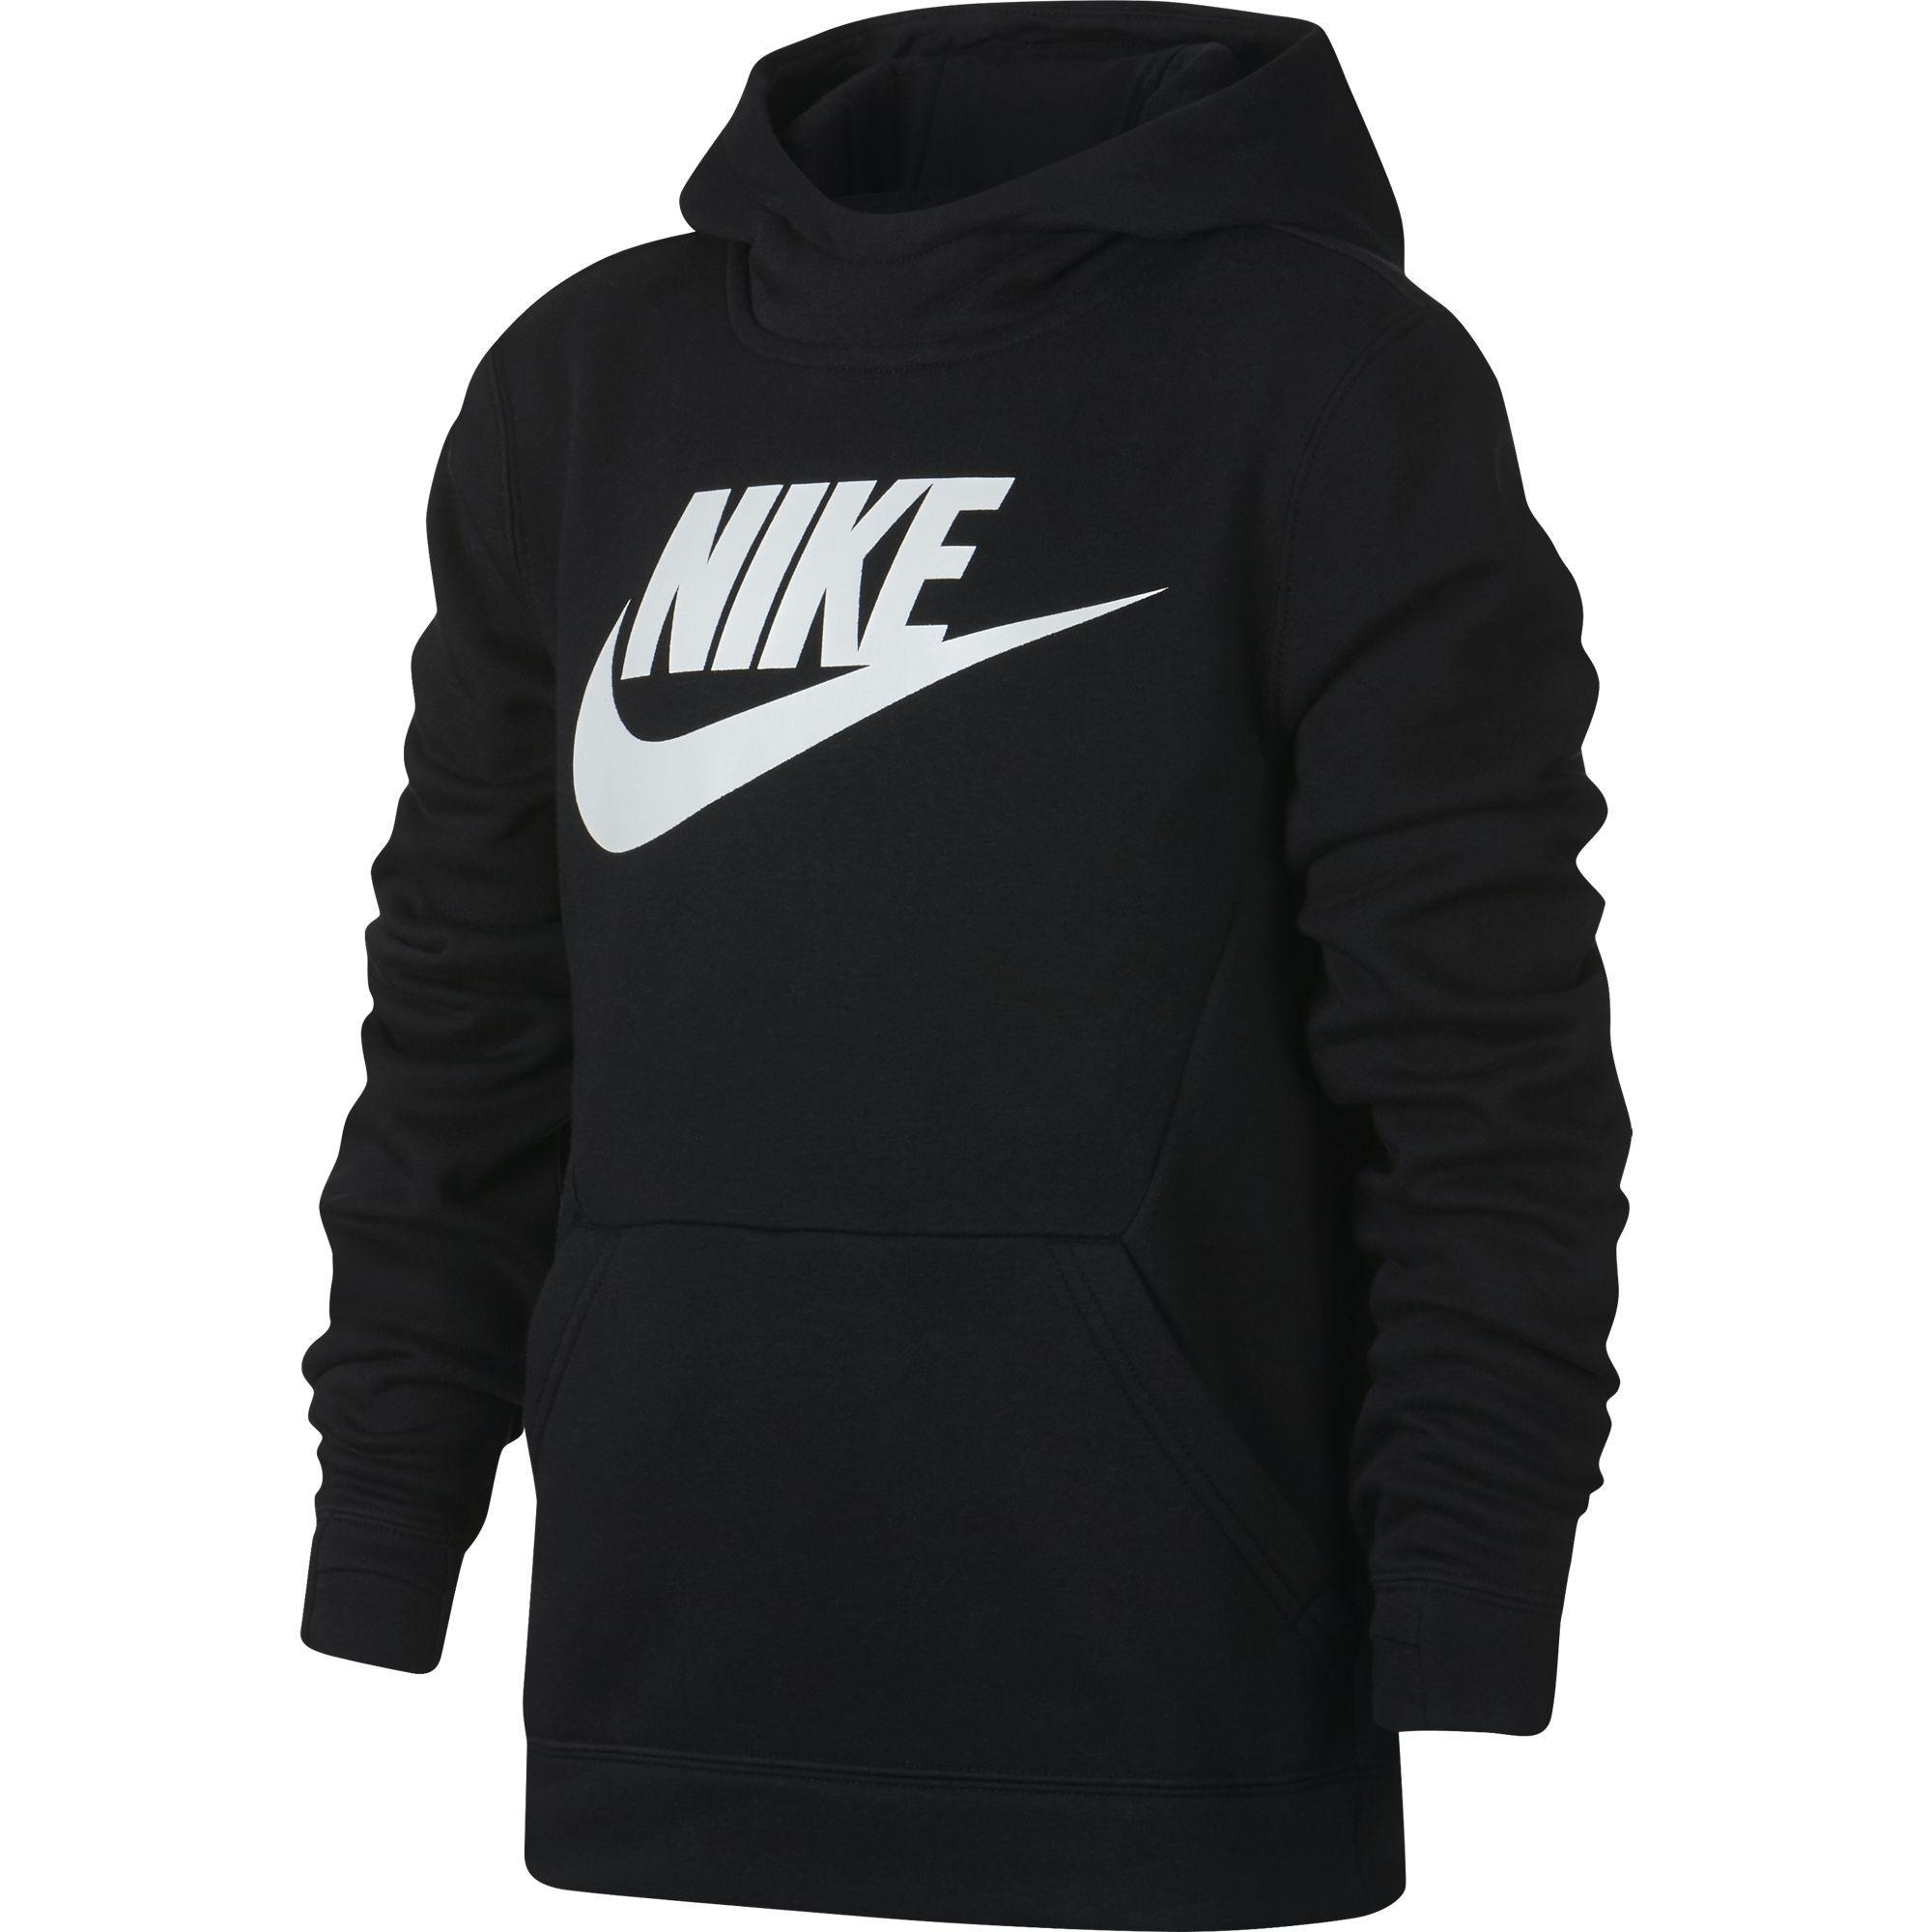 e4325d9d87 Nike Boys Sportswear Pullover Hoodie - Black/White - Tennisnuts.com